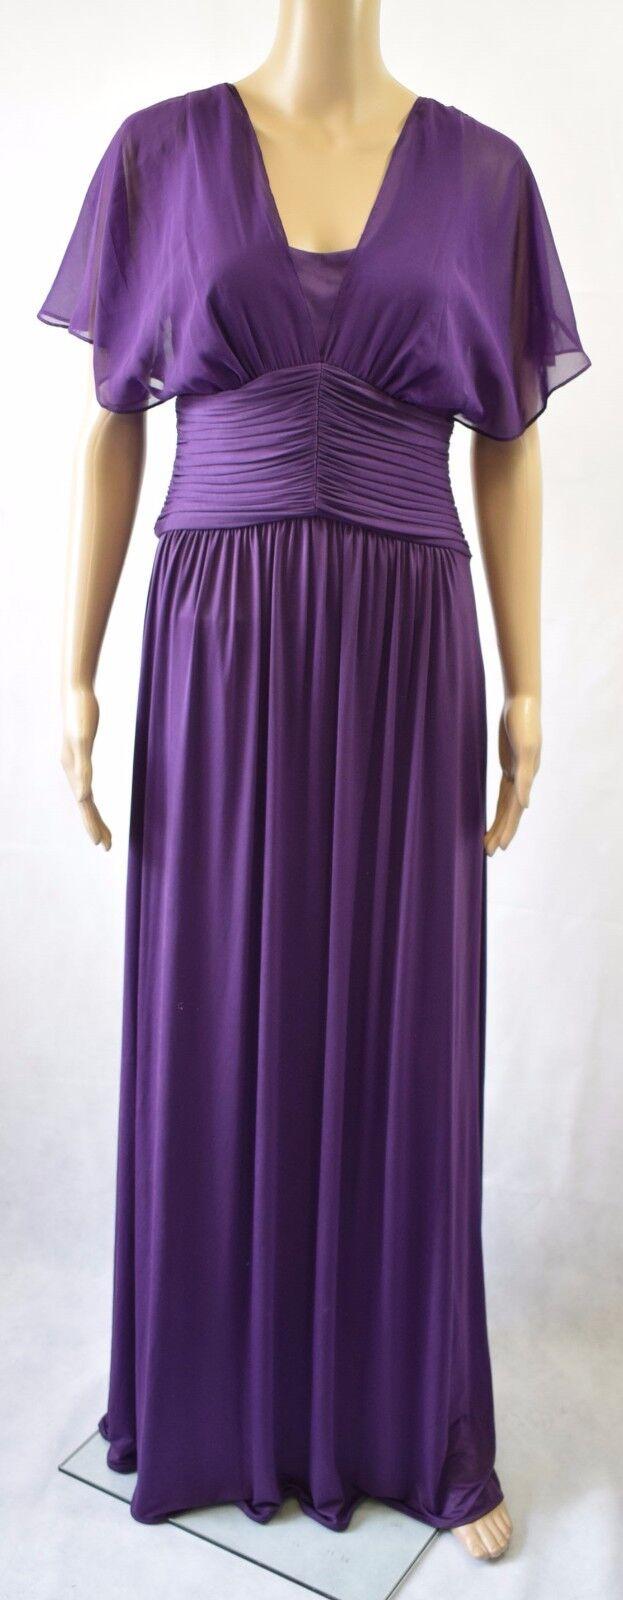 Bnwt John Lewis Helena Chiffon Maxi Dress In lila - UK 18 -    (R182)